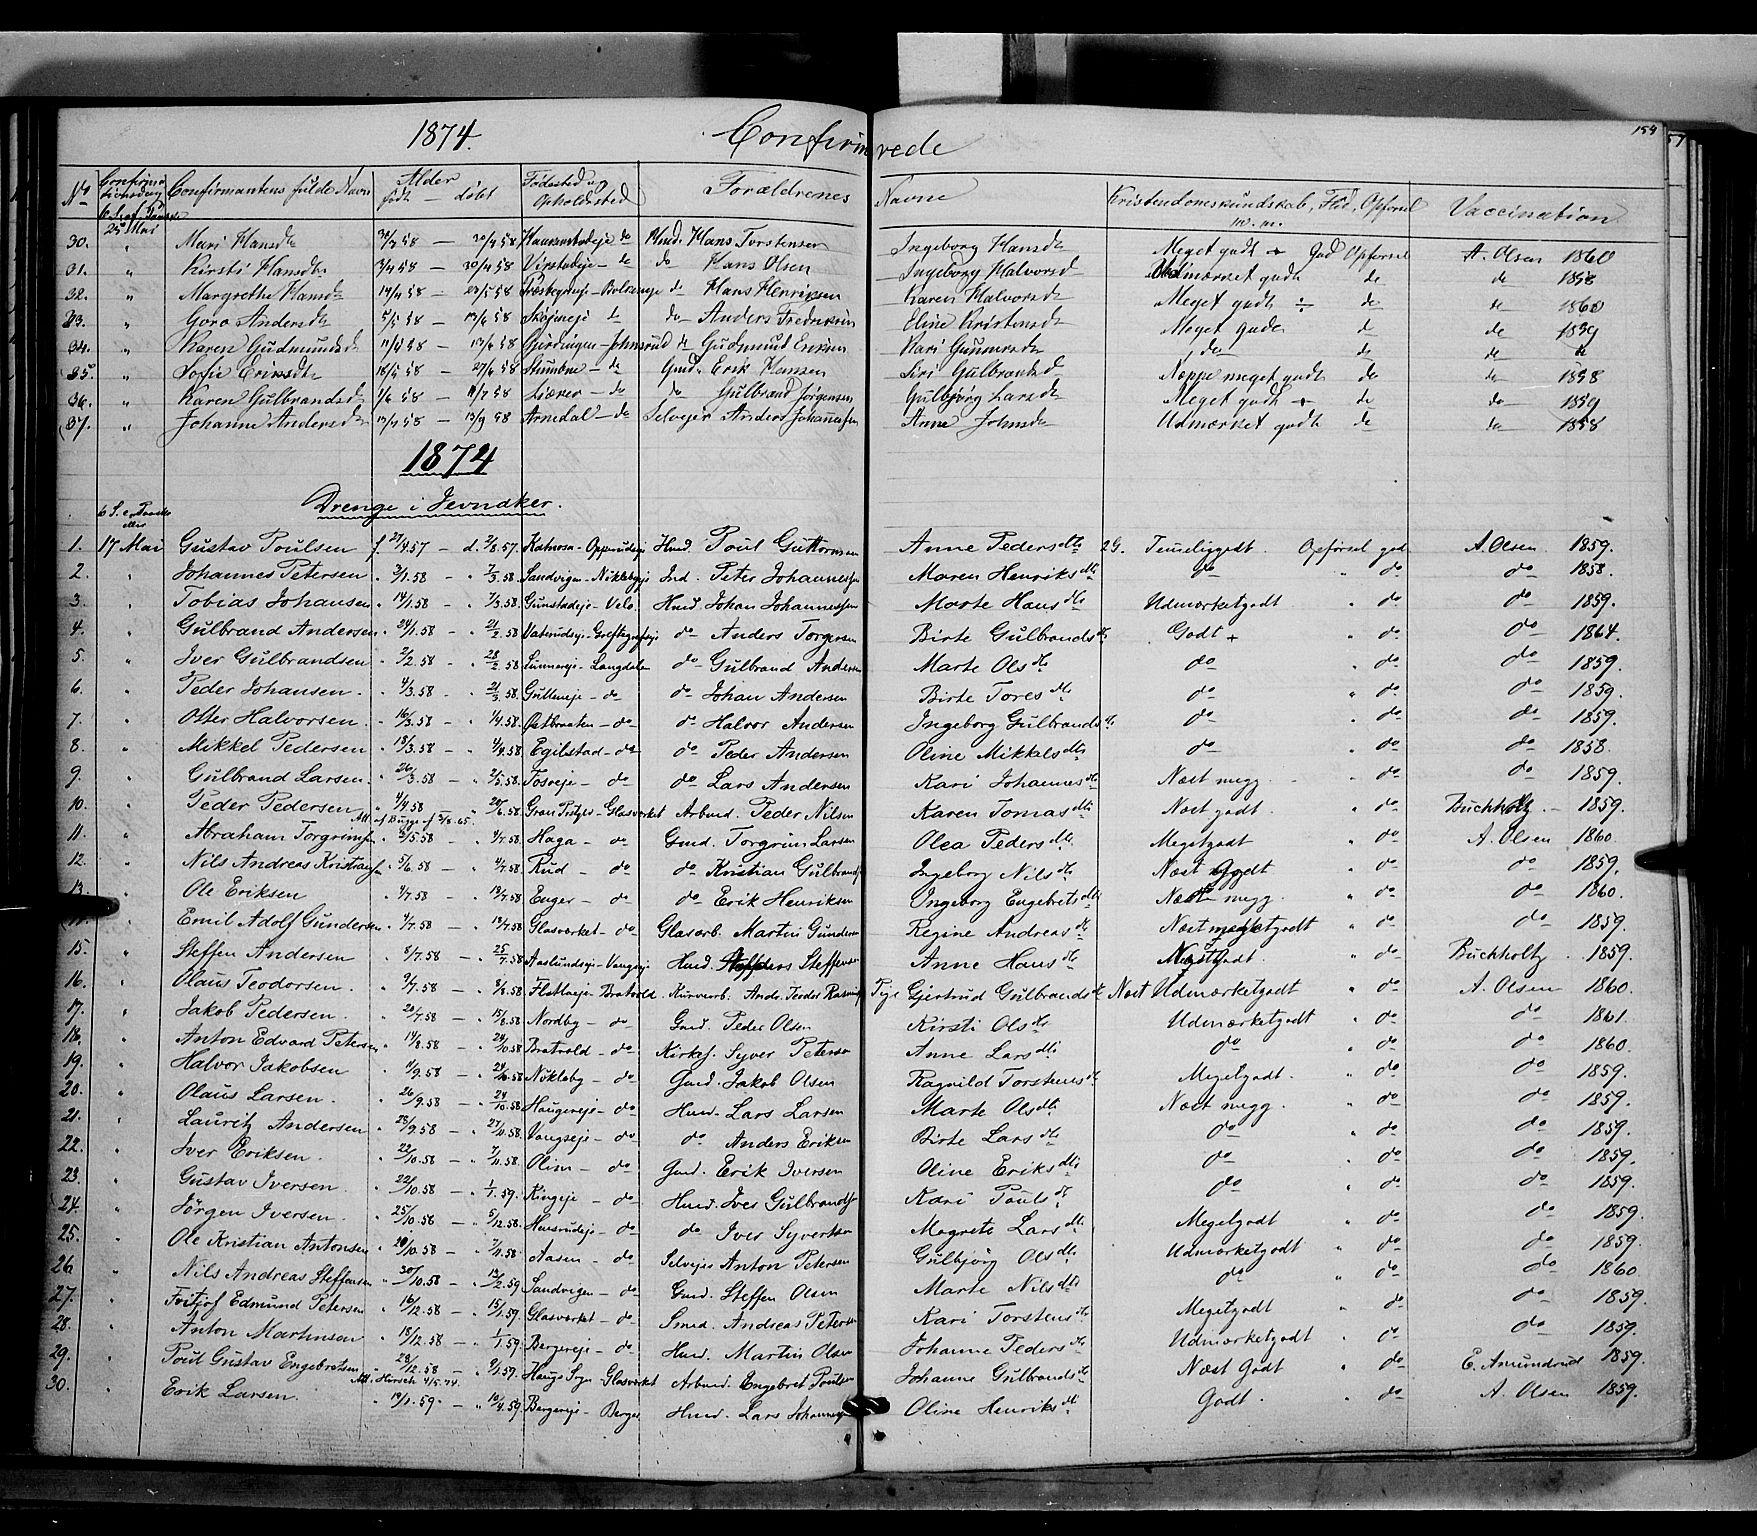 SAH, Jevnaker prestekontor, Ministerialbok nr. 7, 1858-1876, s. 154